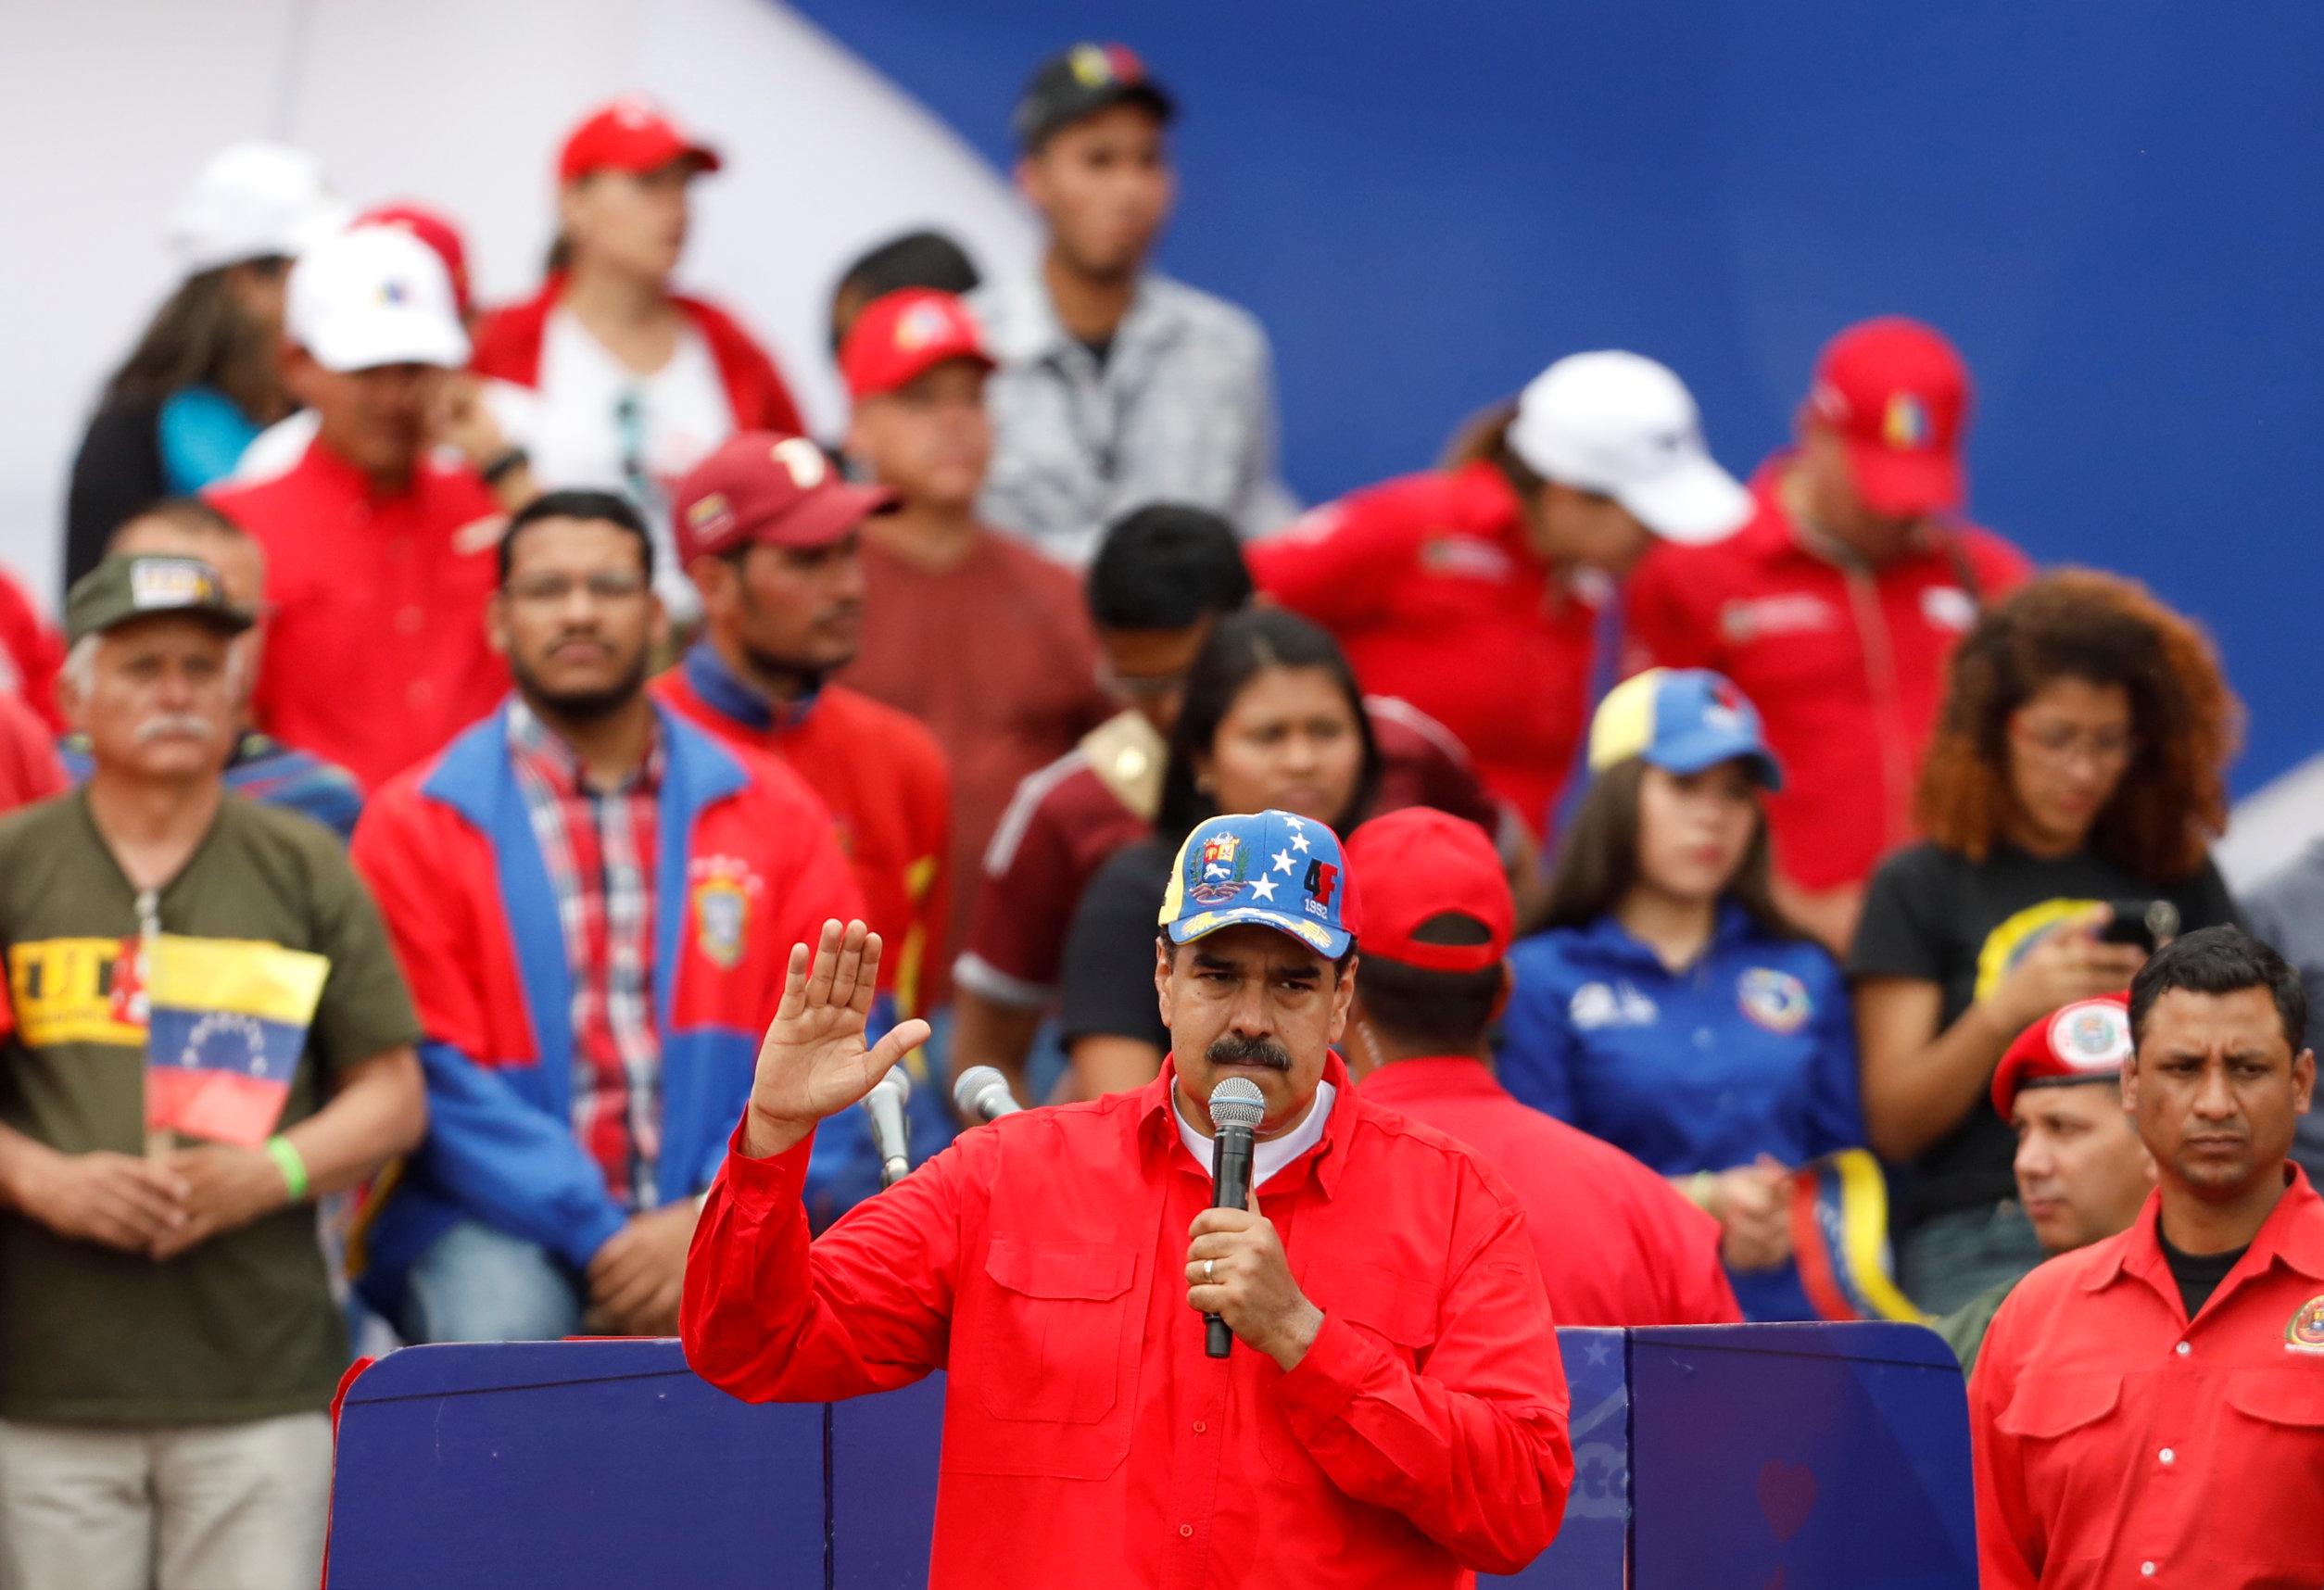 2019 02 02T191449Z 1837305630 RC1A564CC2C0 RTRMADP 3 VENEZUELA POLITICS